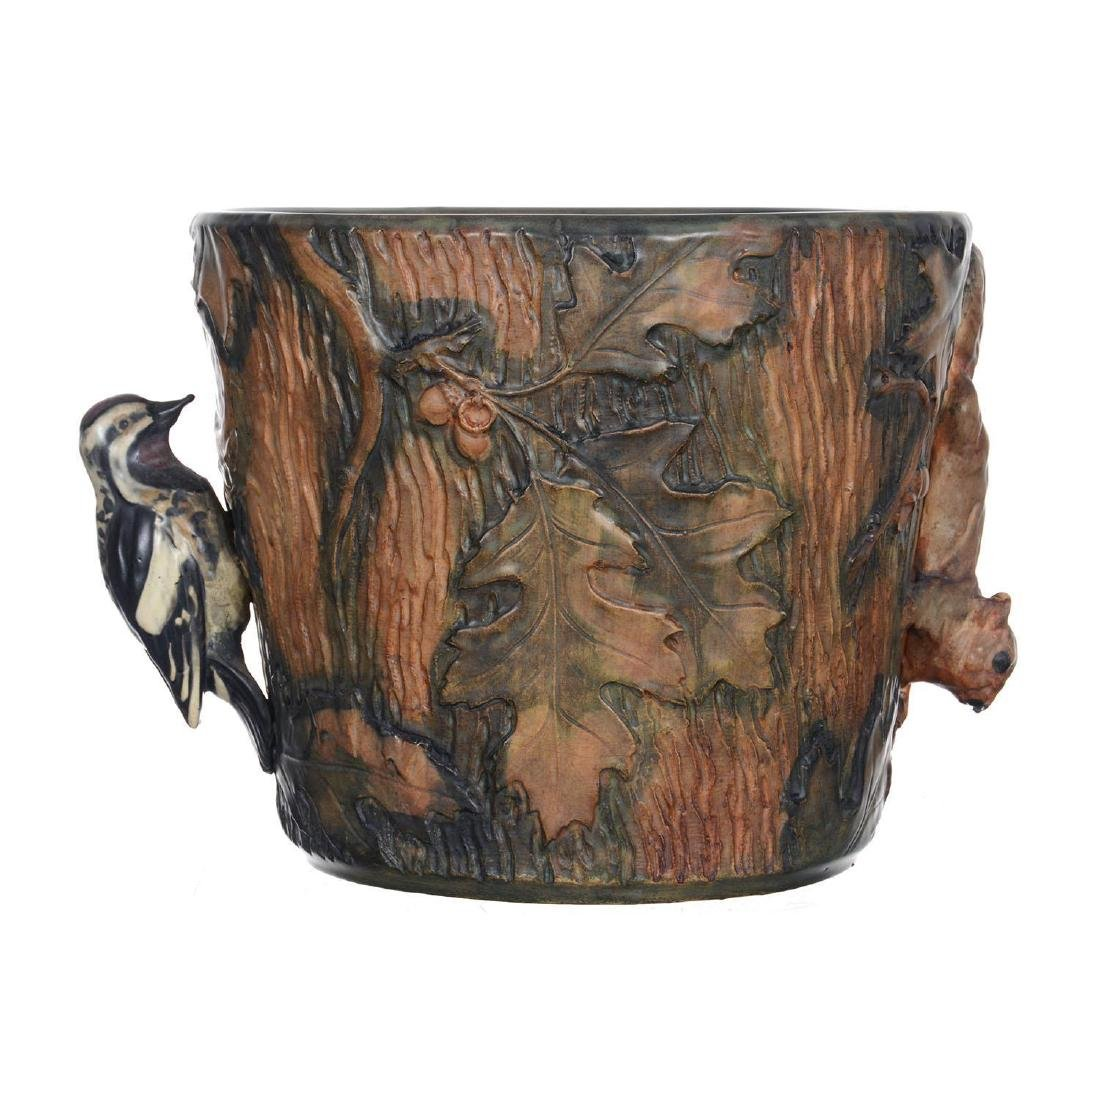 "9.5"" X 11"" Marked Weller Art Pottery Jardiniere - 2"